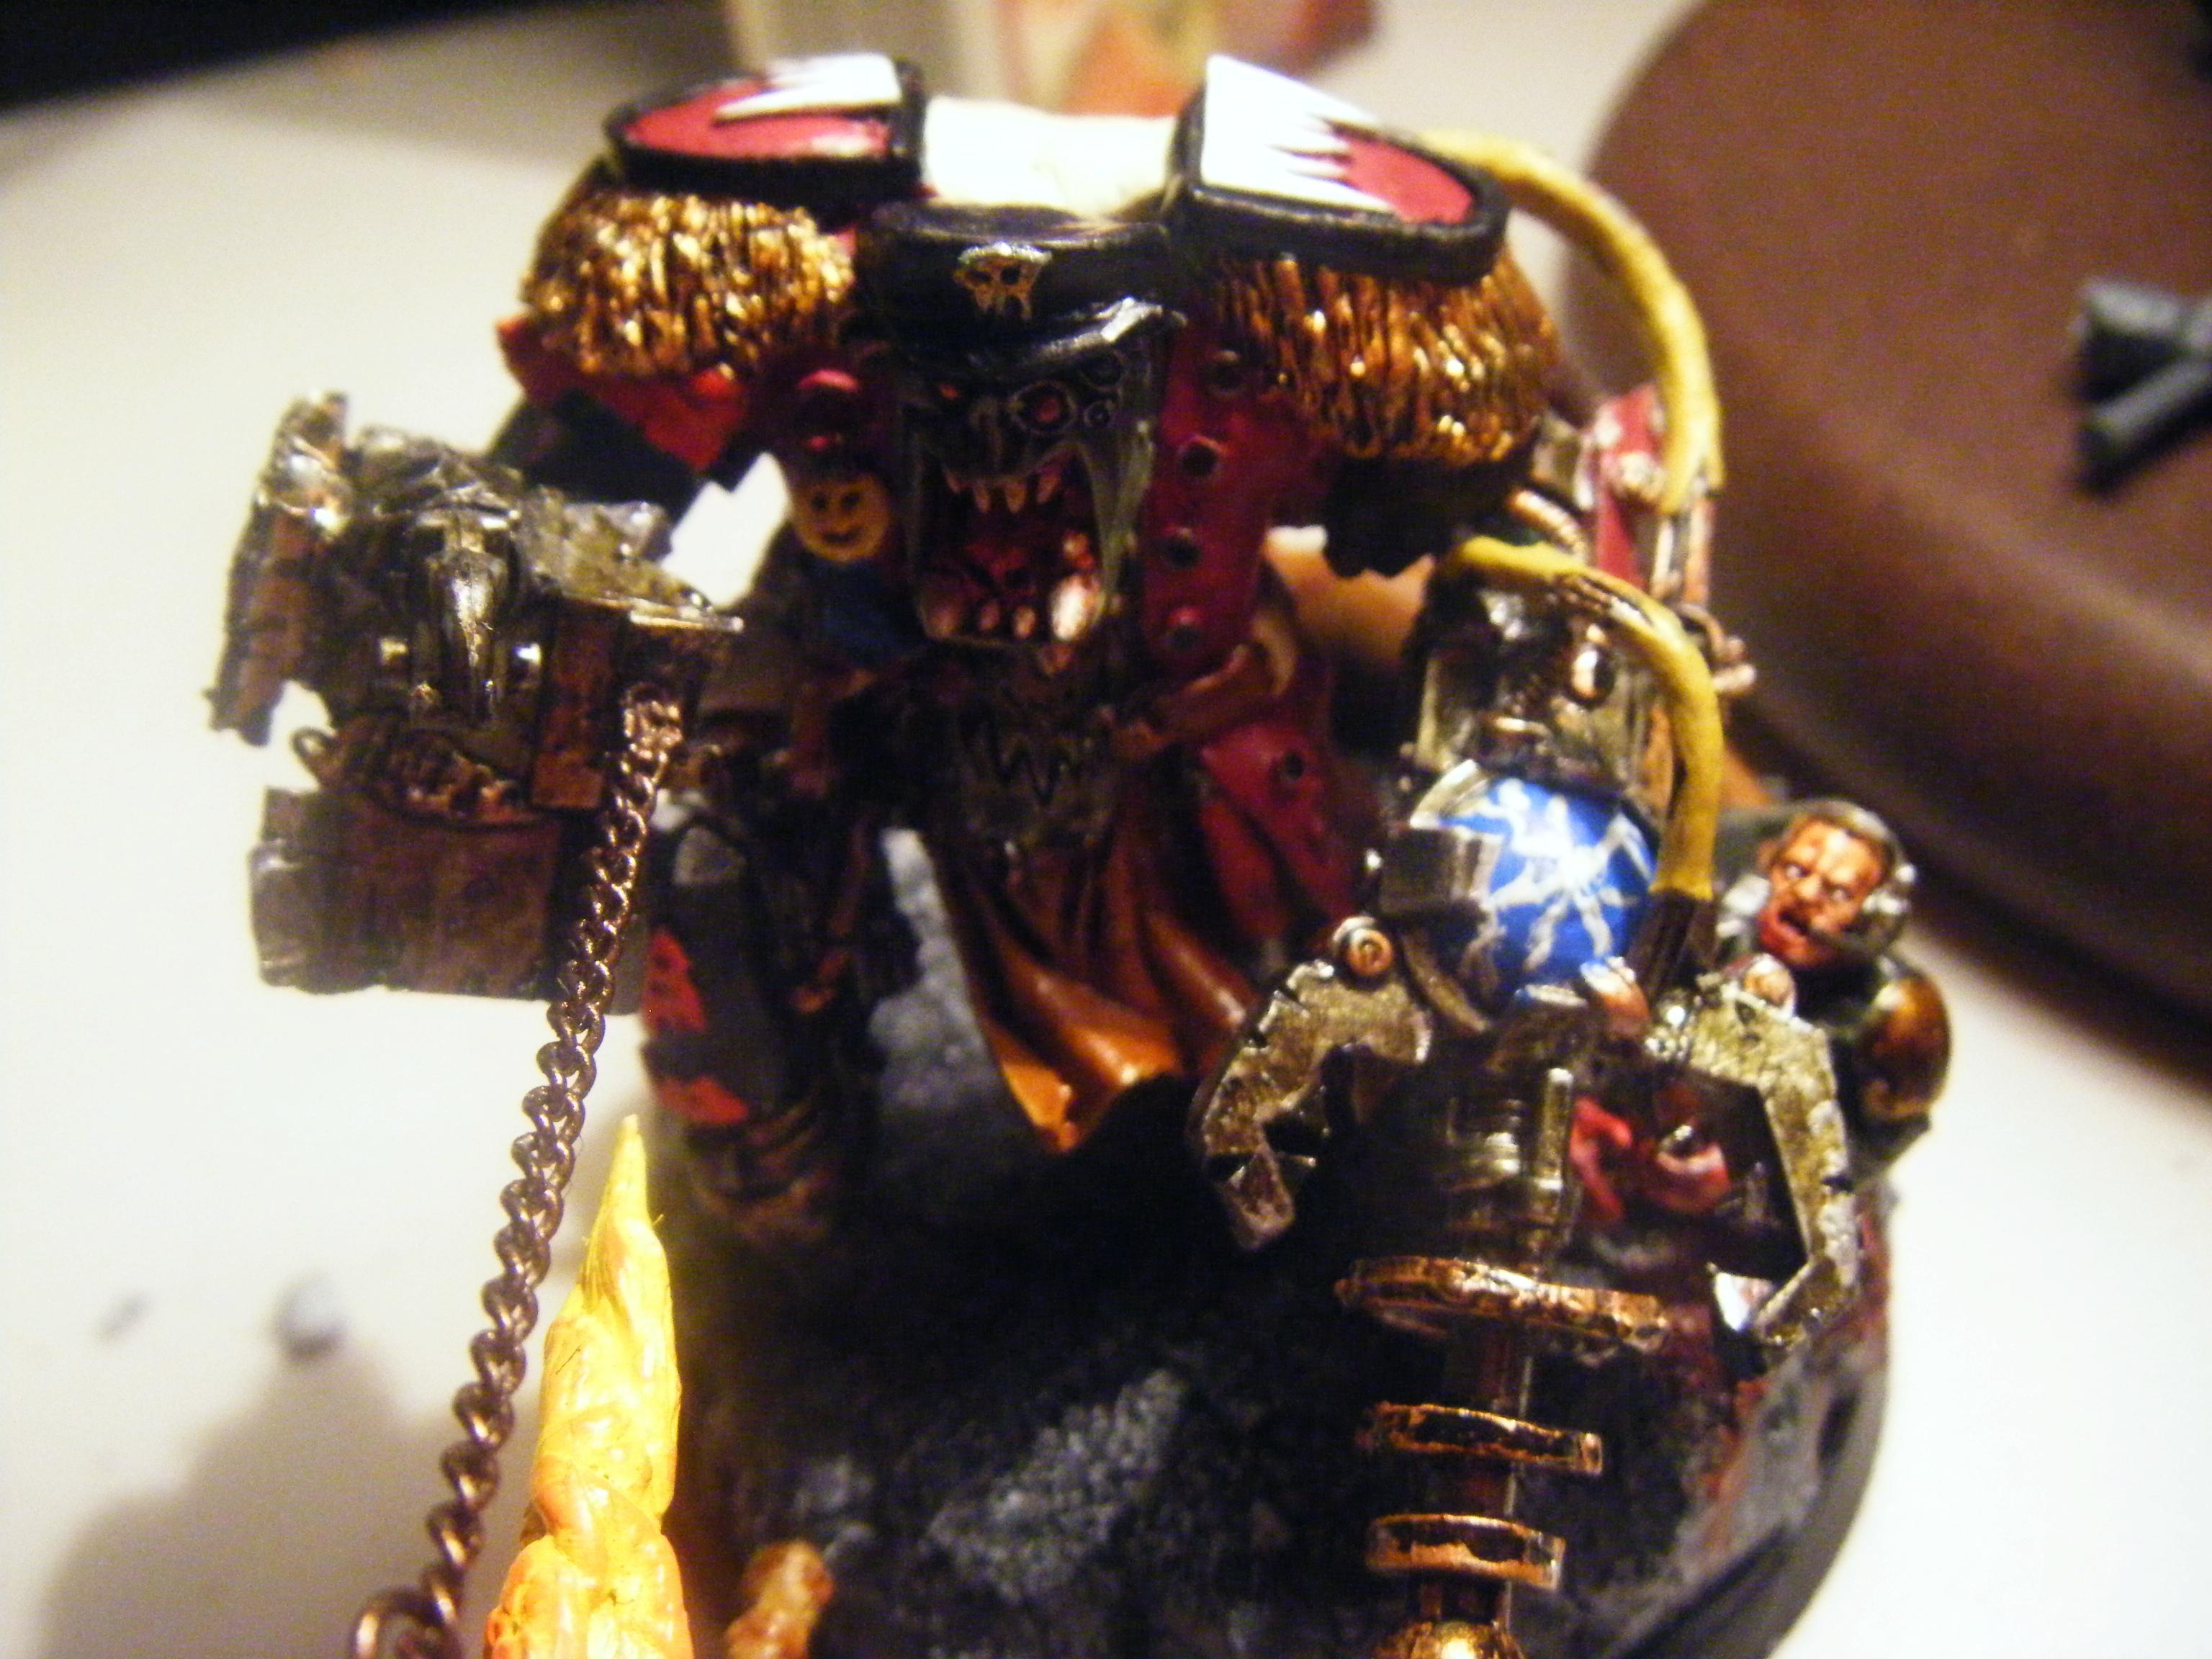 Conversion, Orks, Warhammer 40,000